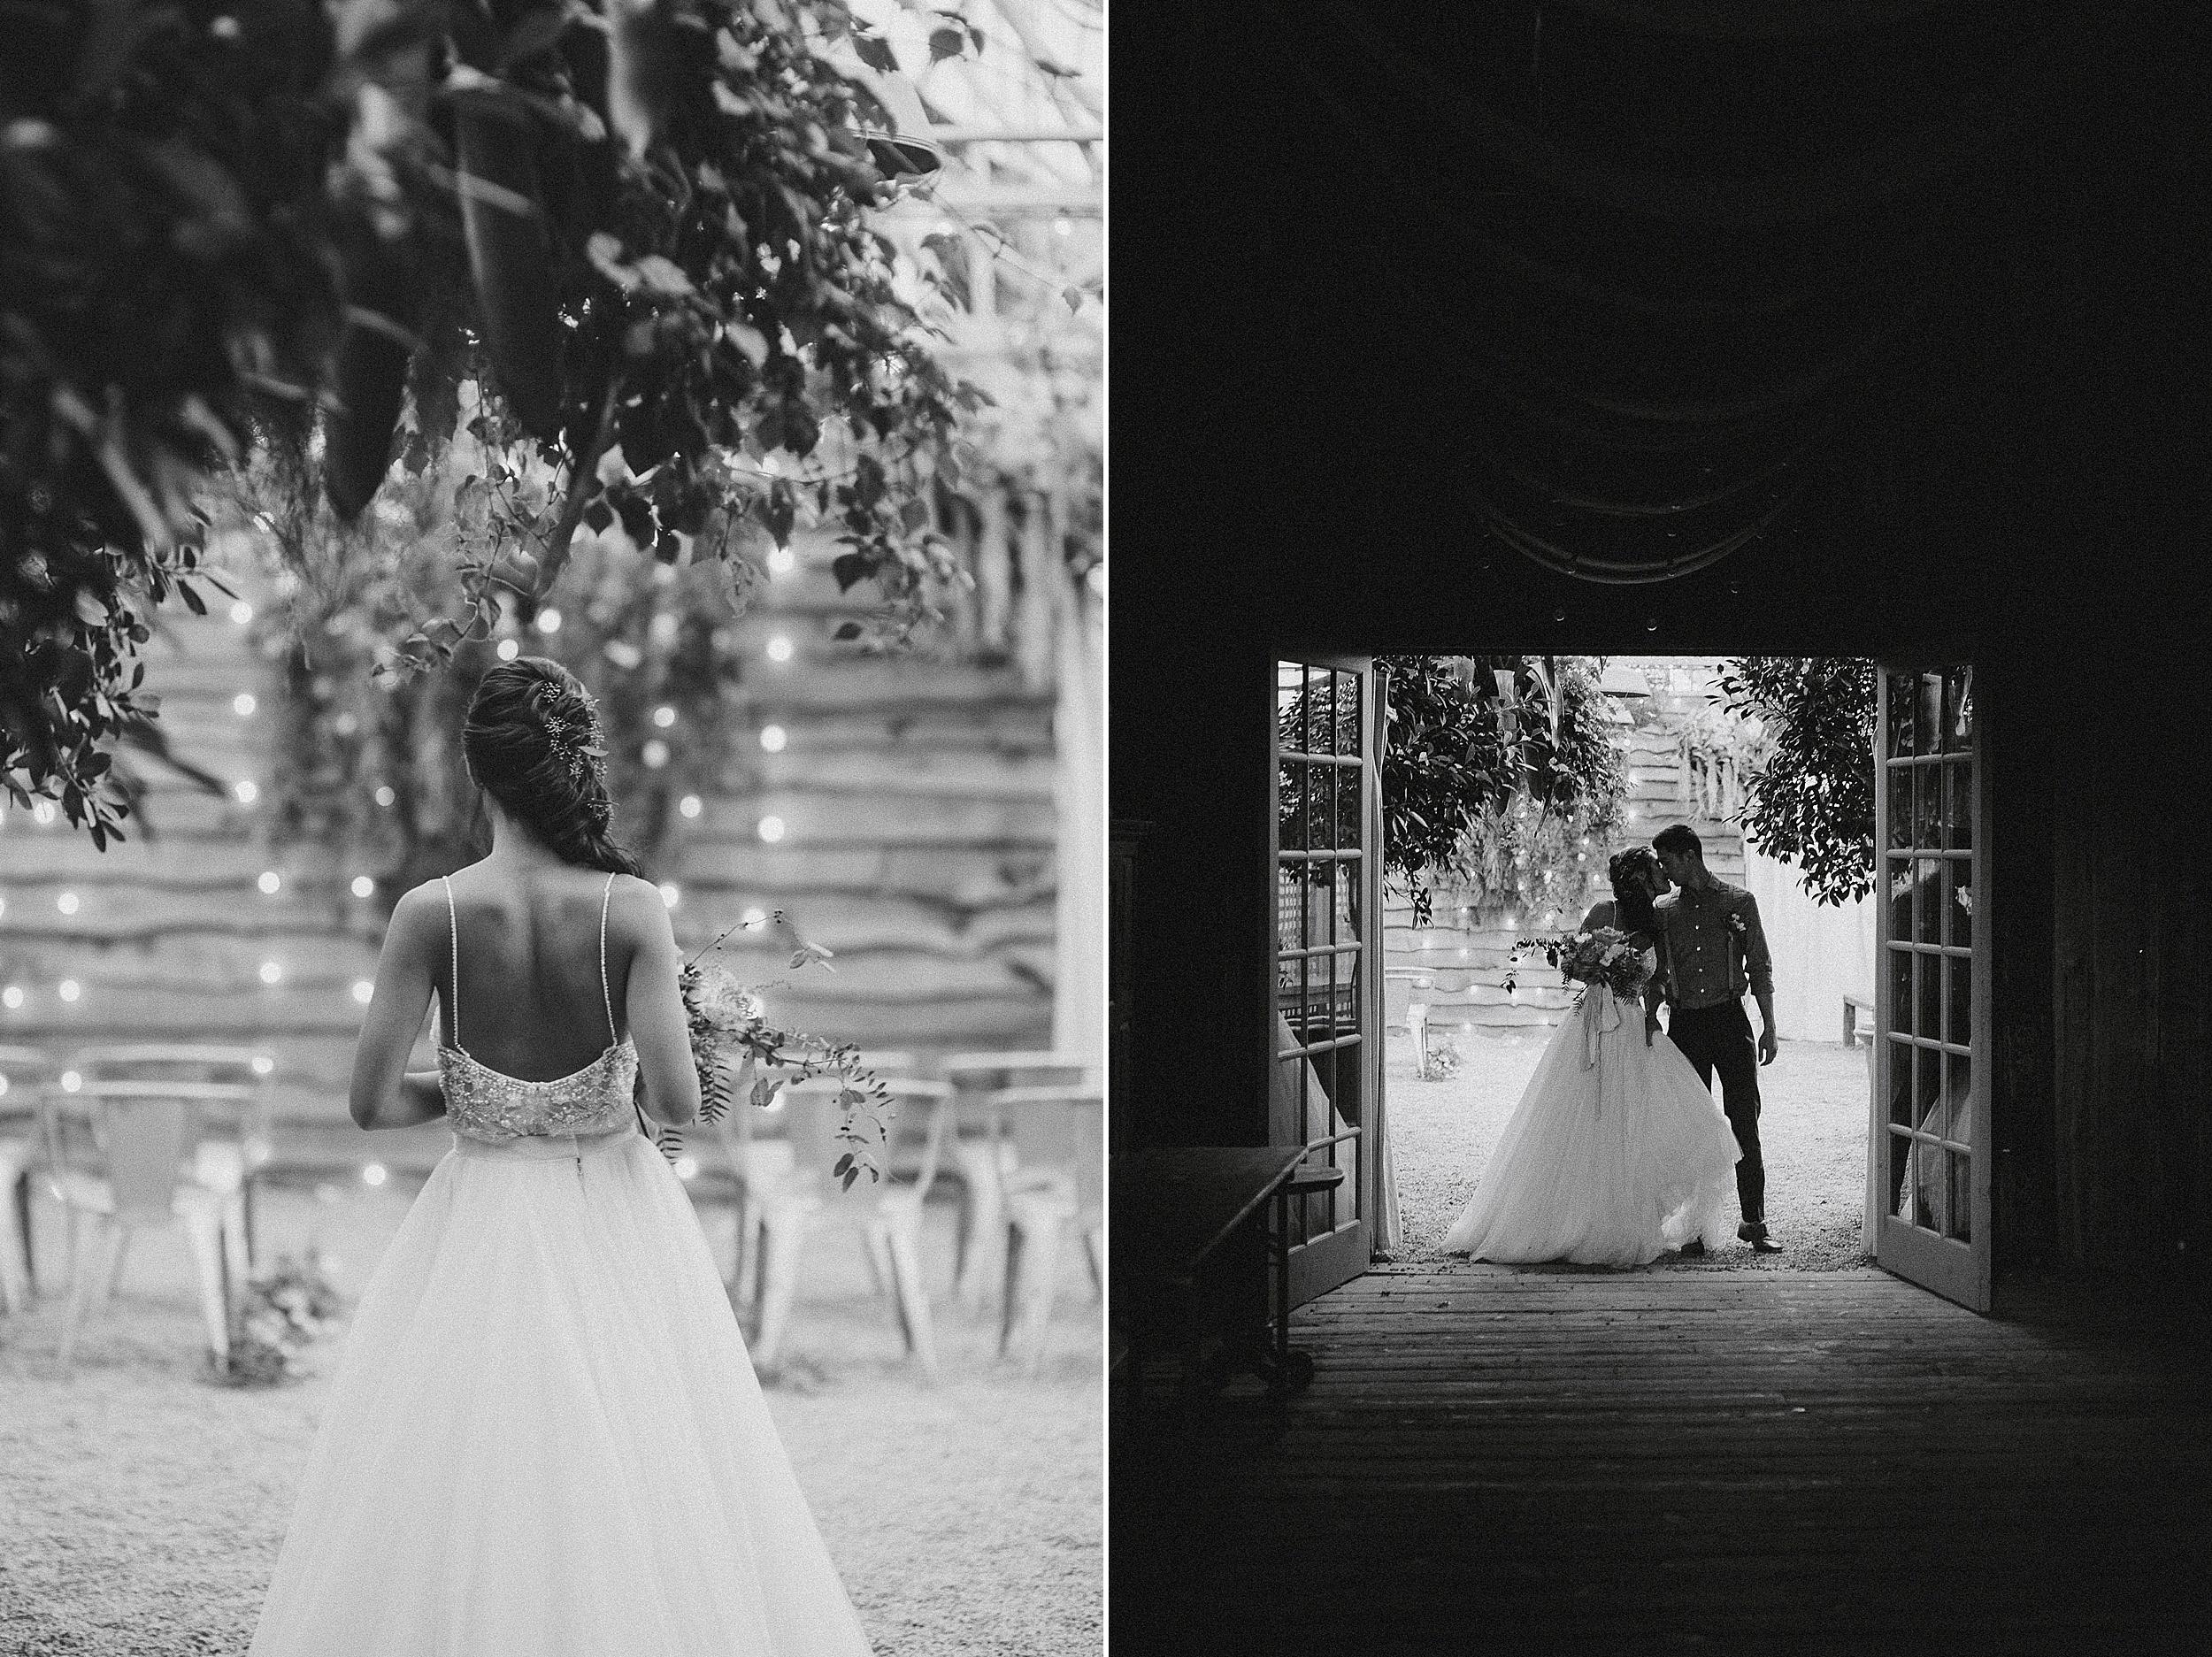 terrain-at-styers-wedding-photography-84.jpg